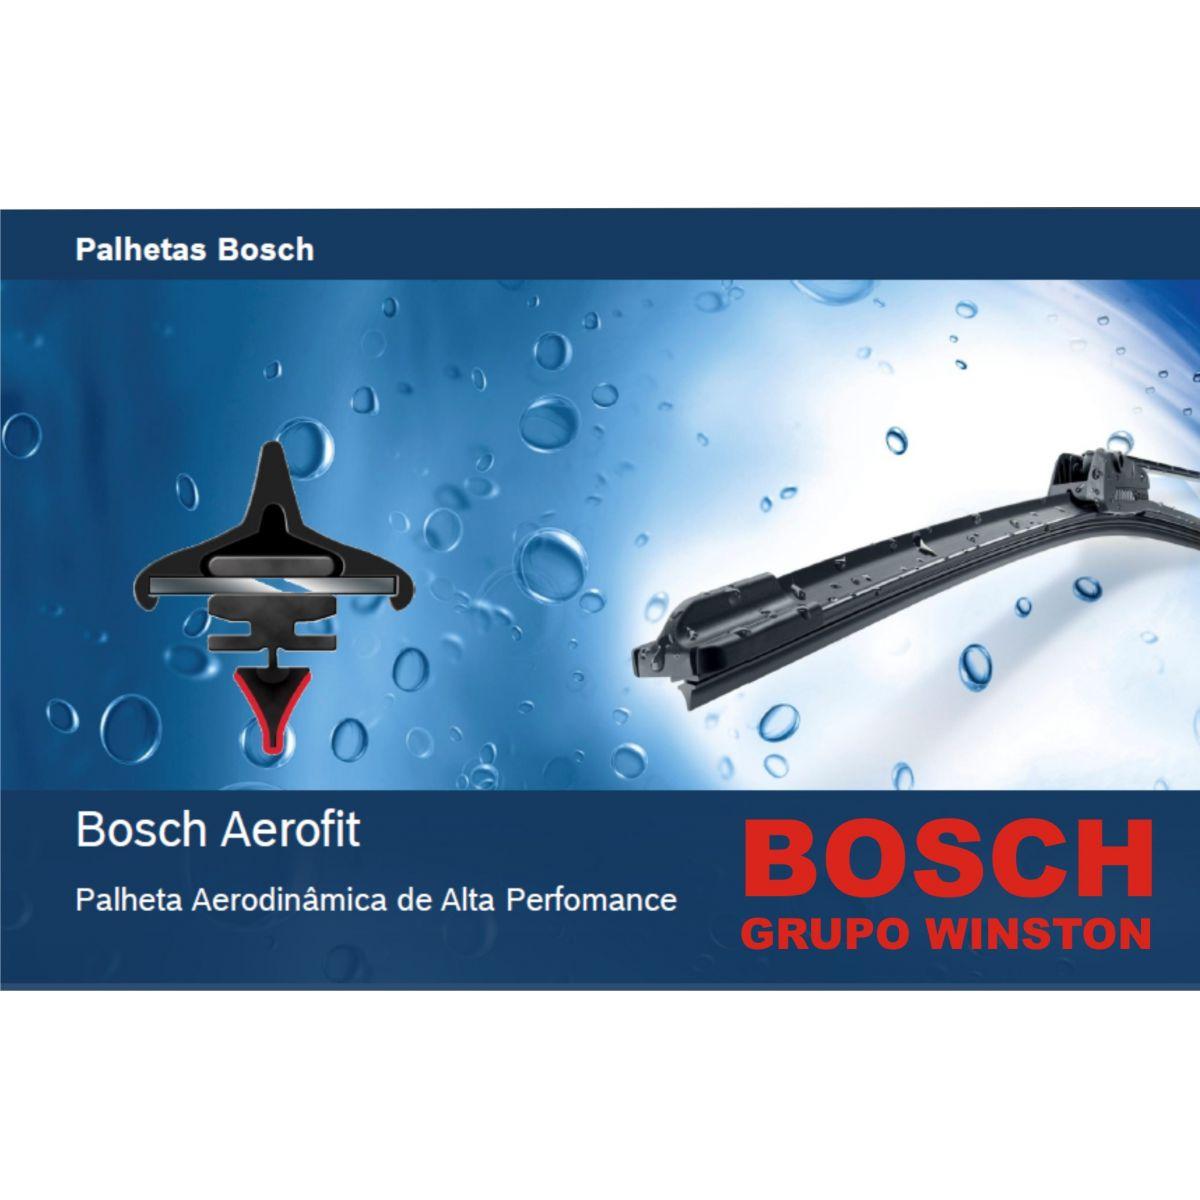 Palheta Bosch Aerofit Limpador de para brisa Bosch CITROEN Xantia / Break